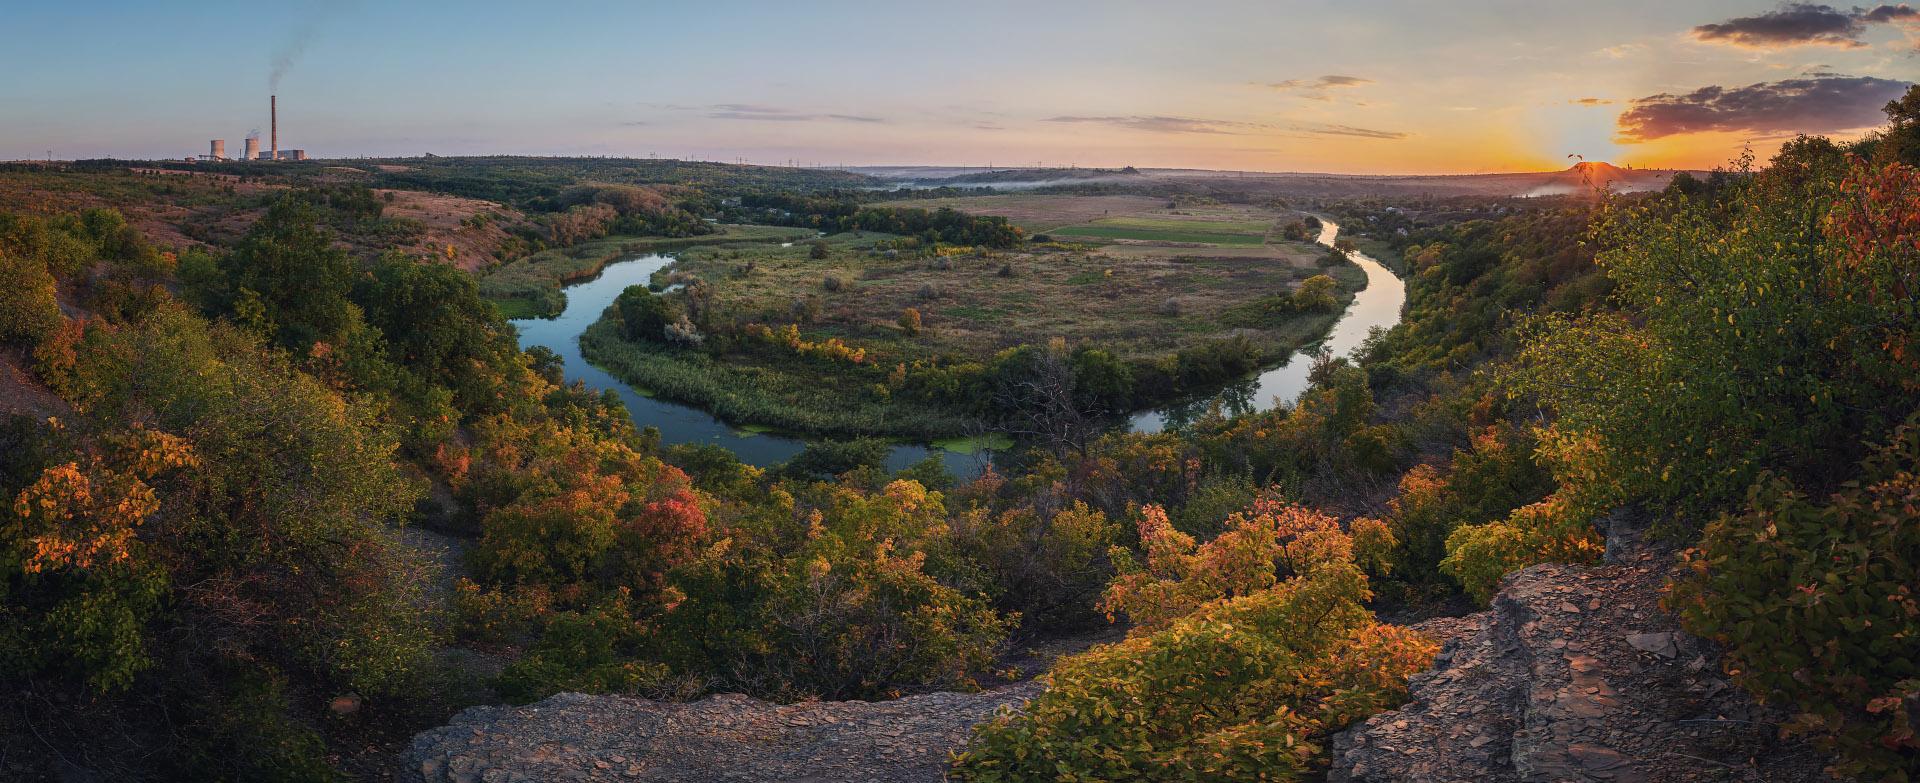 "photo ""Krynka River"" tags: landscape, nature, panoramic, river, sunset, Крынка"